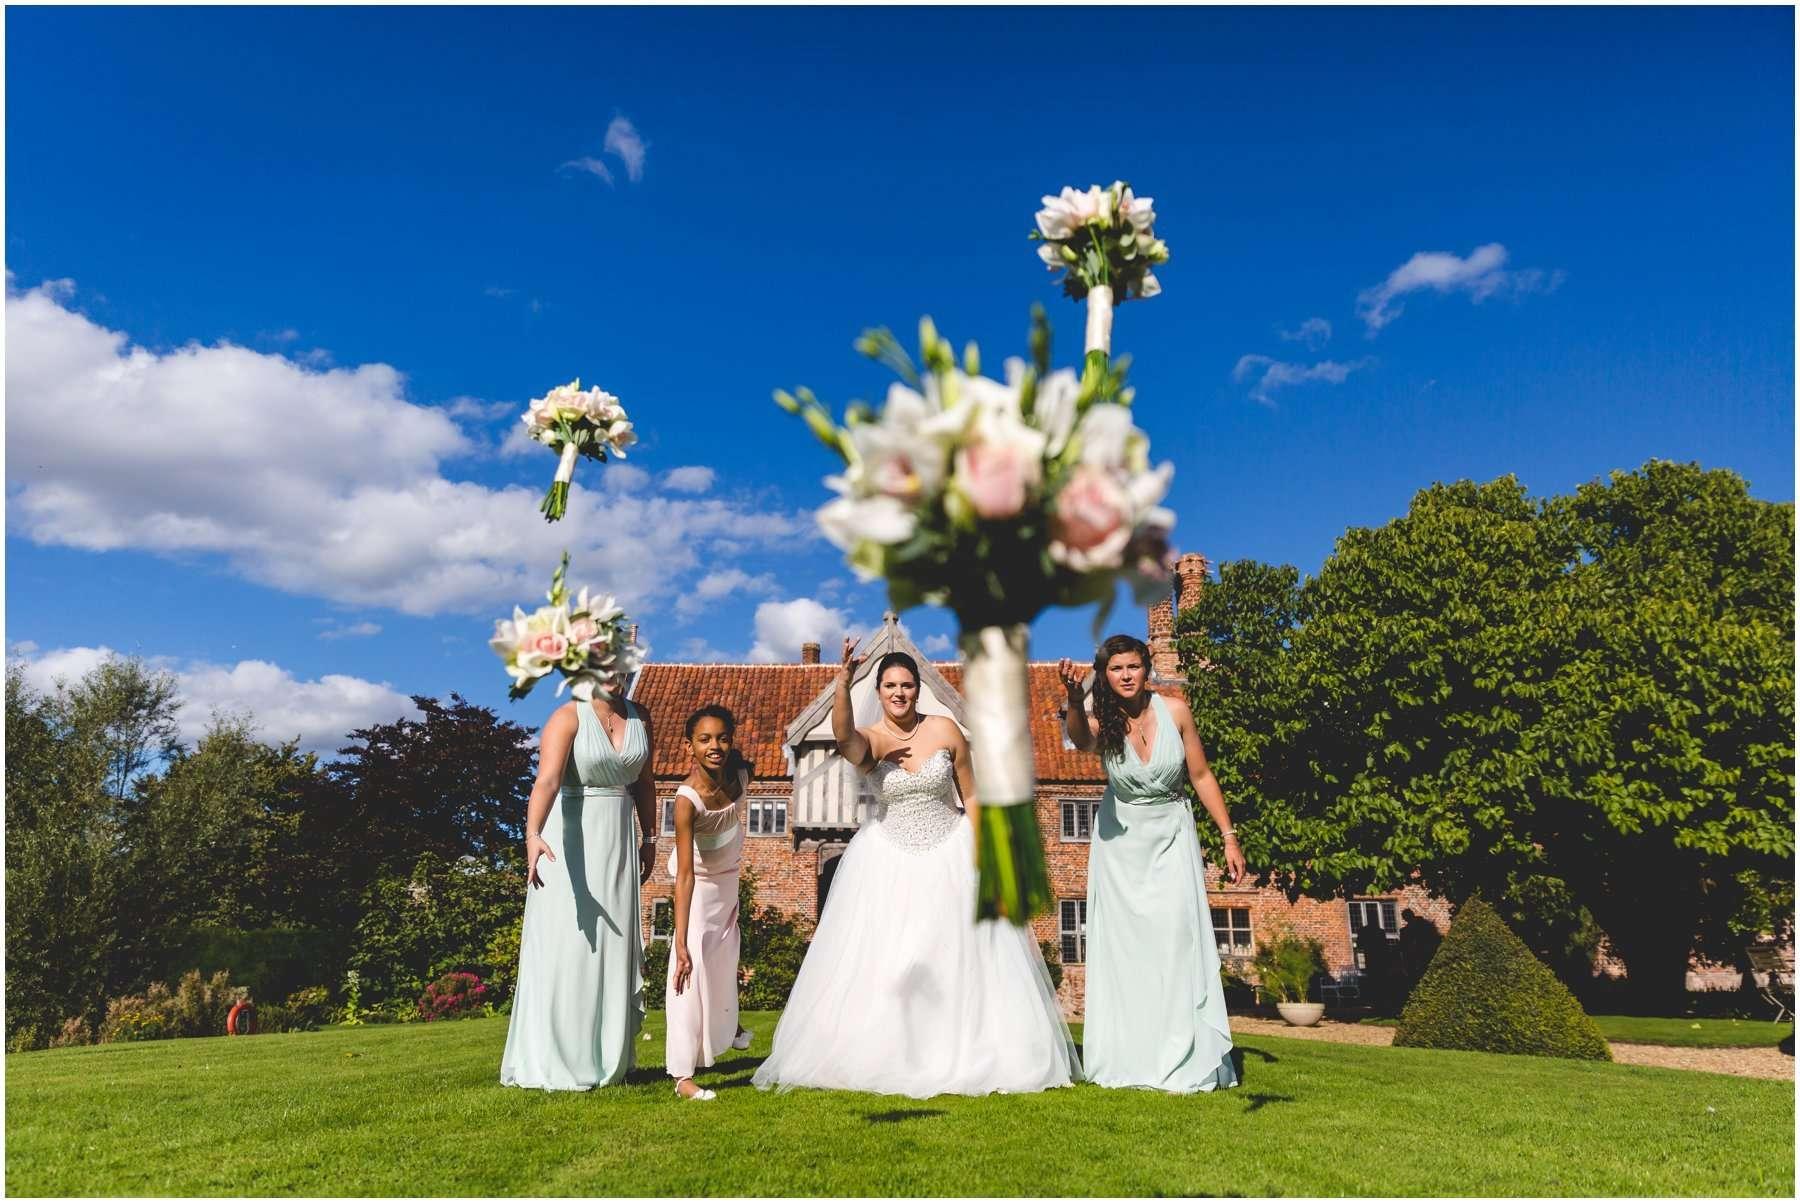 HALES HALL BARN WEDDING - NATALIE AND TOBY - NORWICH WEDDING PHOTOGRAPHER